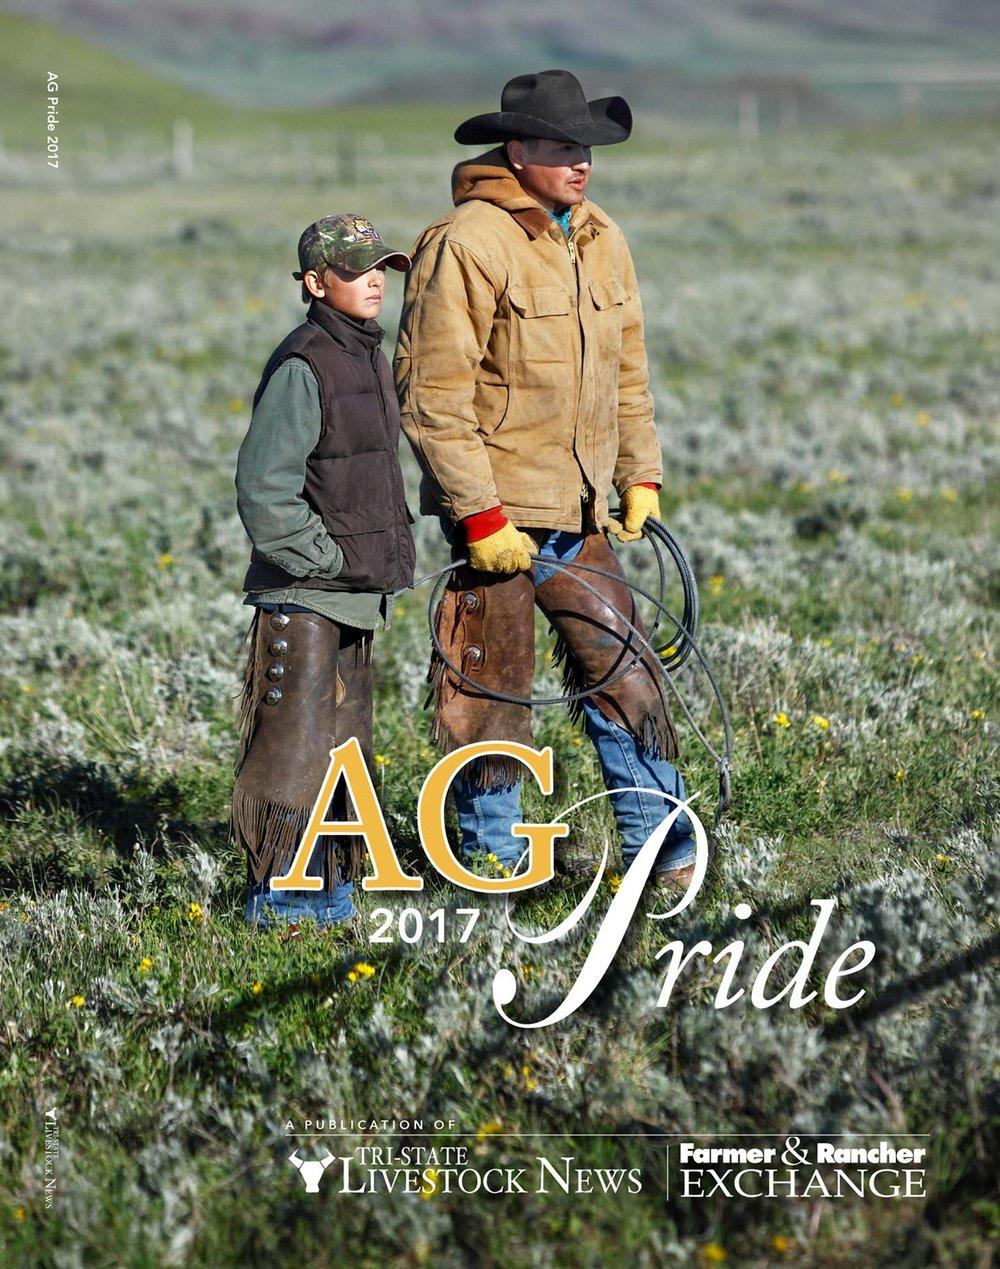 Tri-State Livestock New Ag Pride